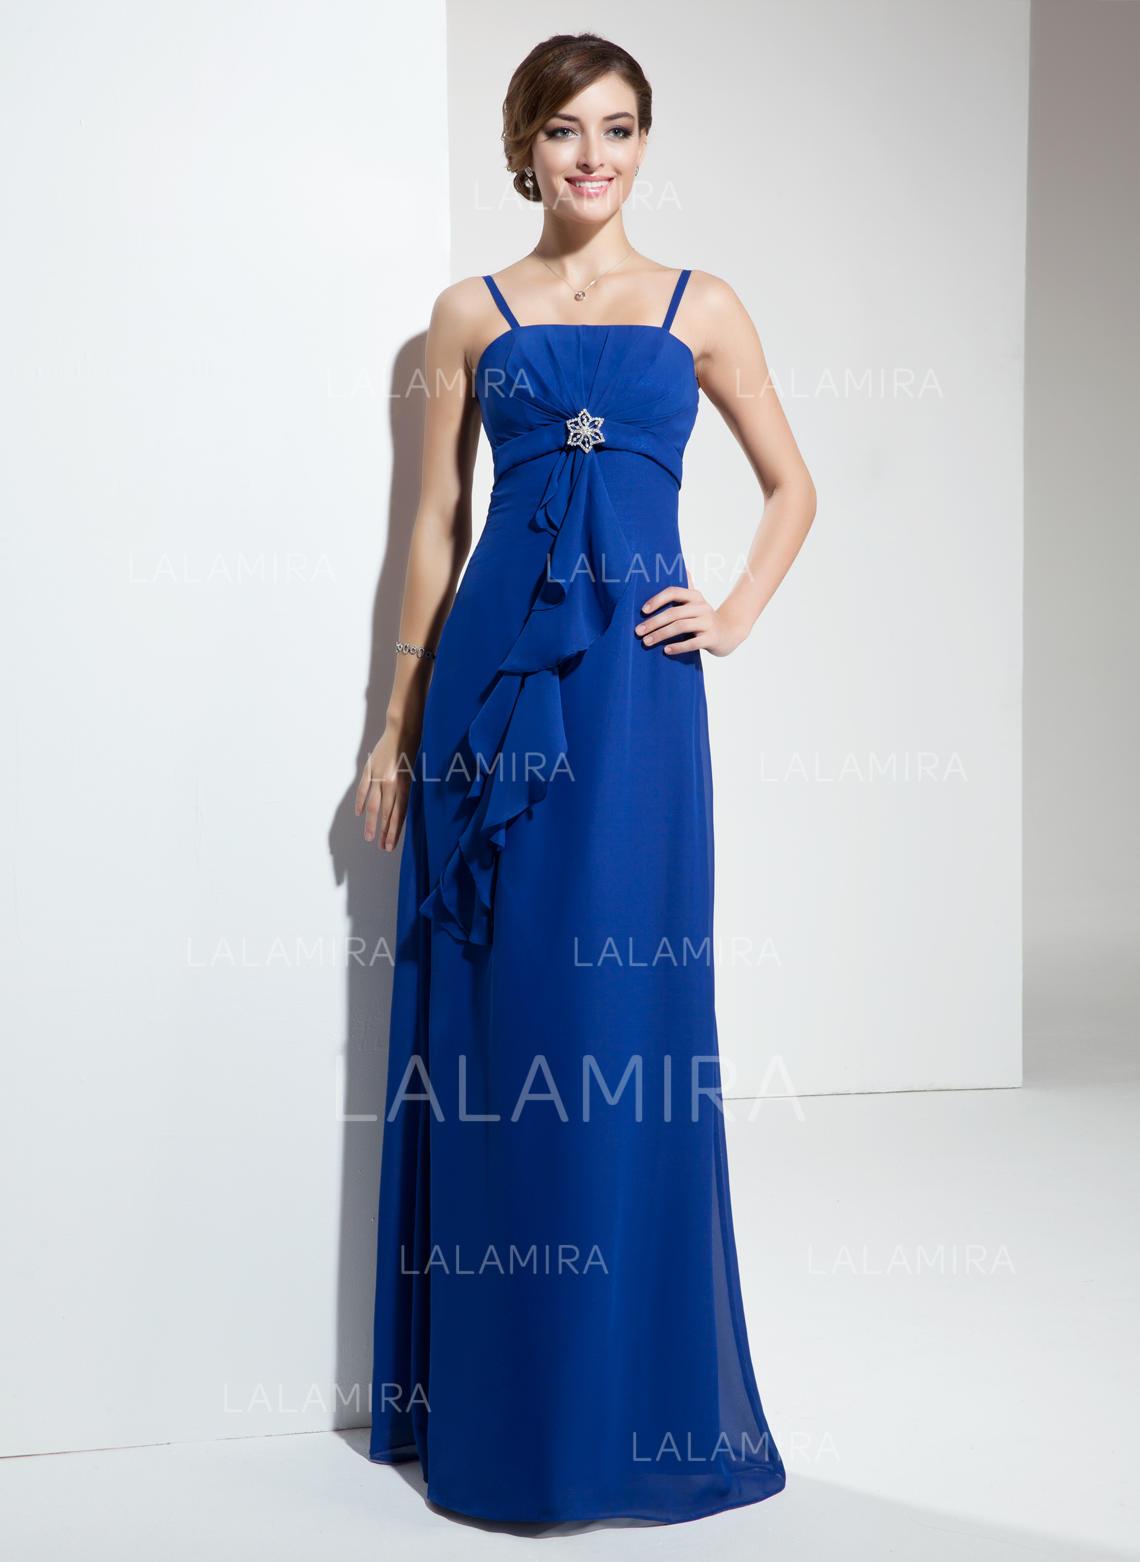 df17d5b623 Empire Chiffon Bridesmaid Dresses Crystal Brooch Cascading Ruffles  Sleeveless Floor-Length (007001118). Loading zoom